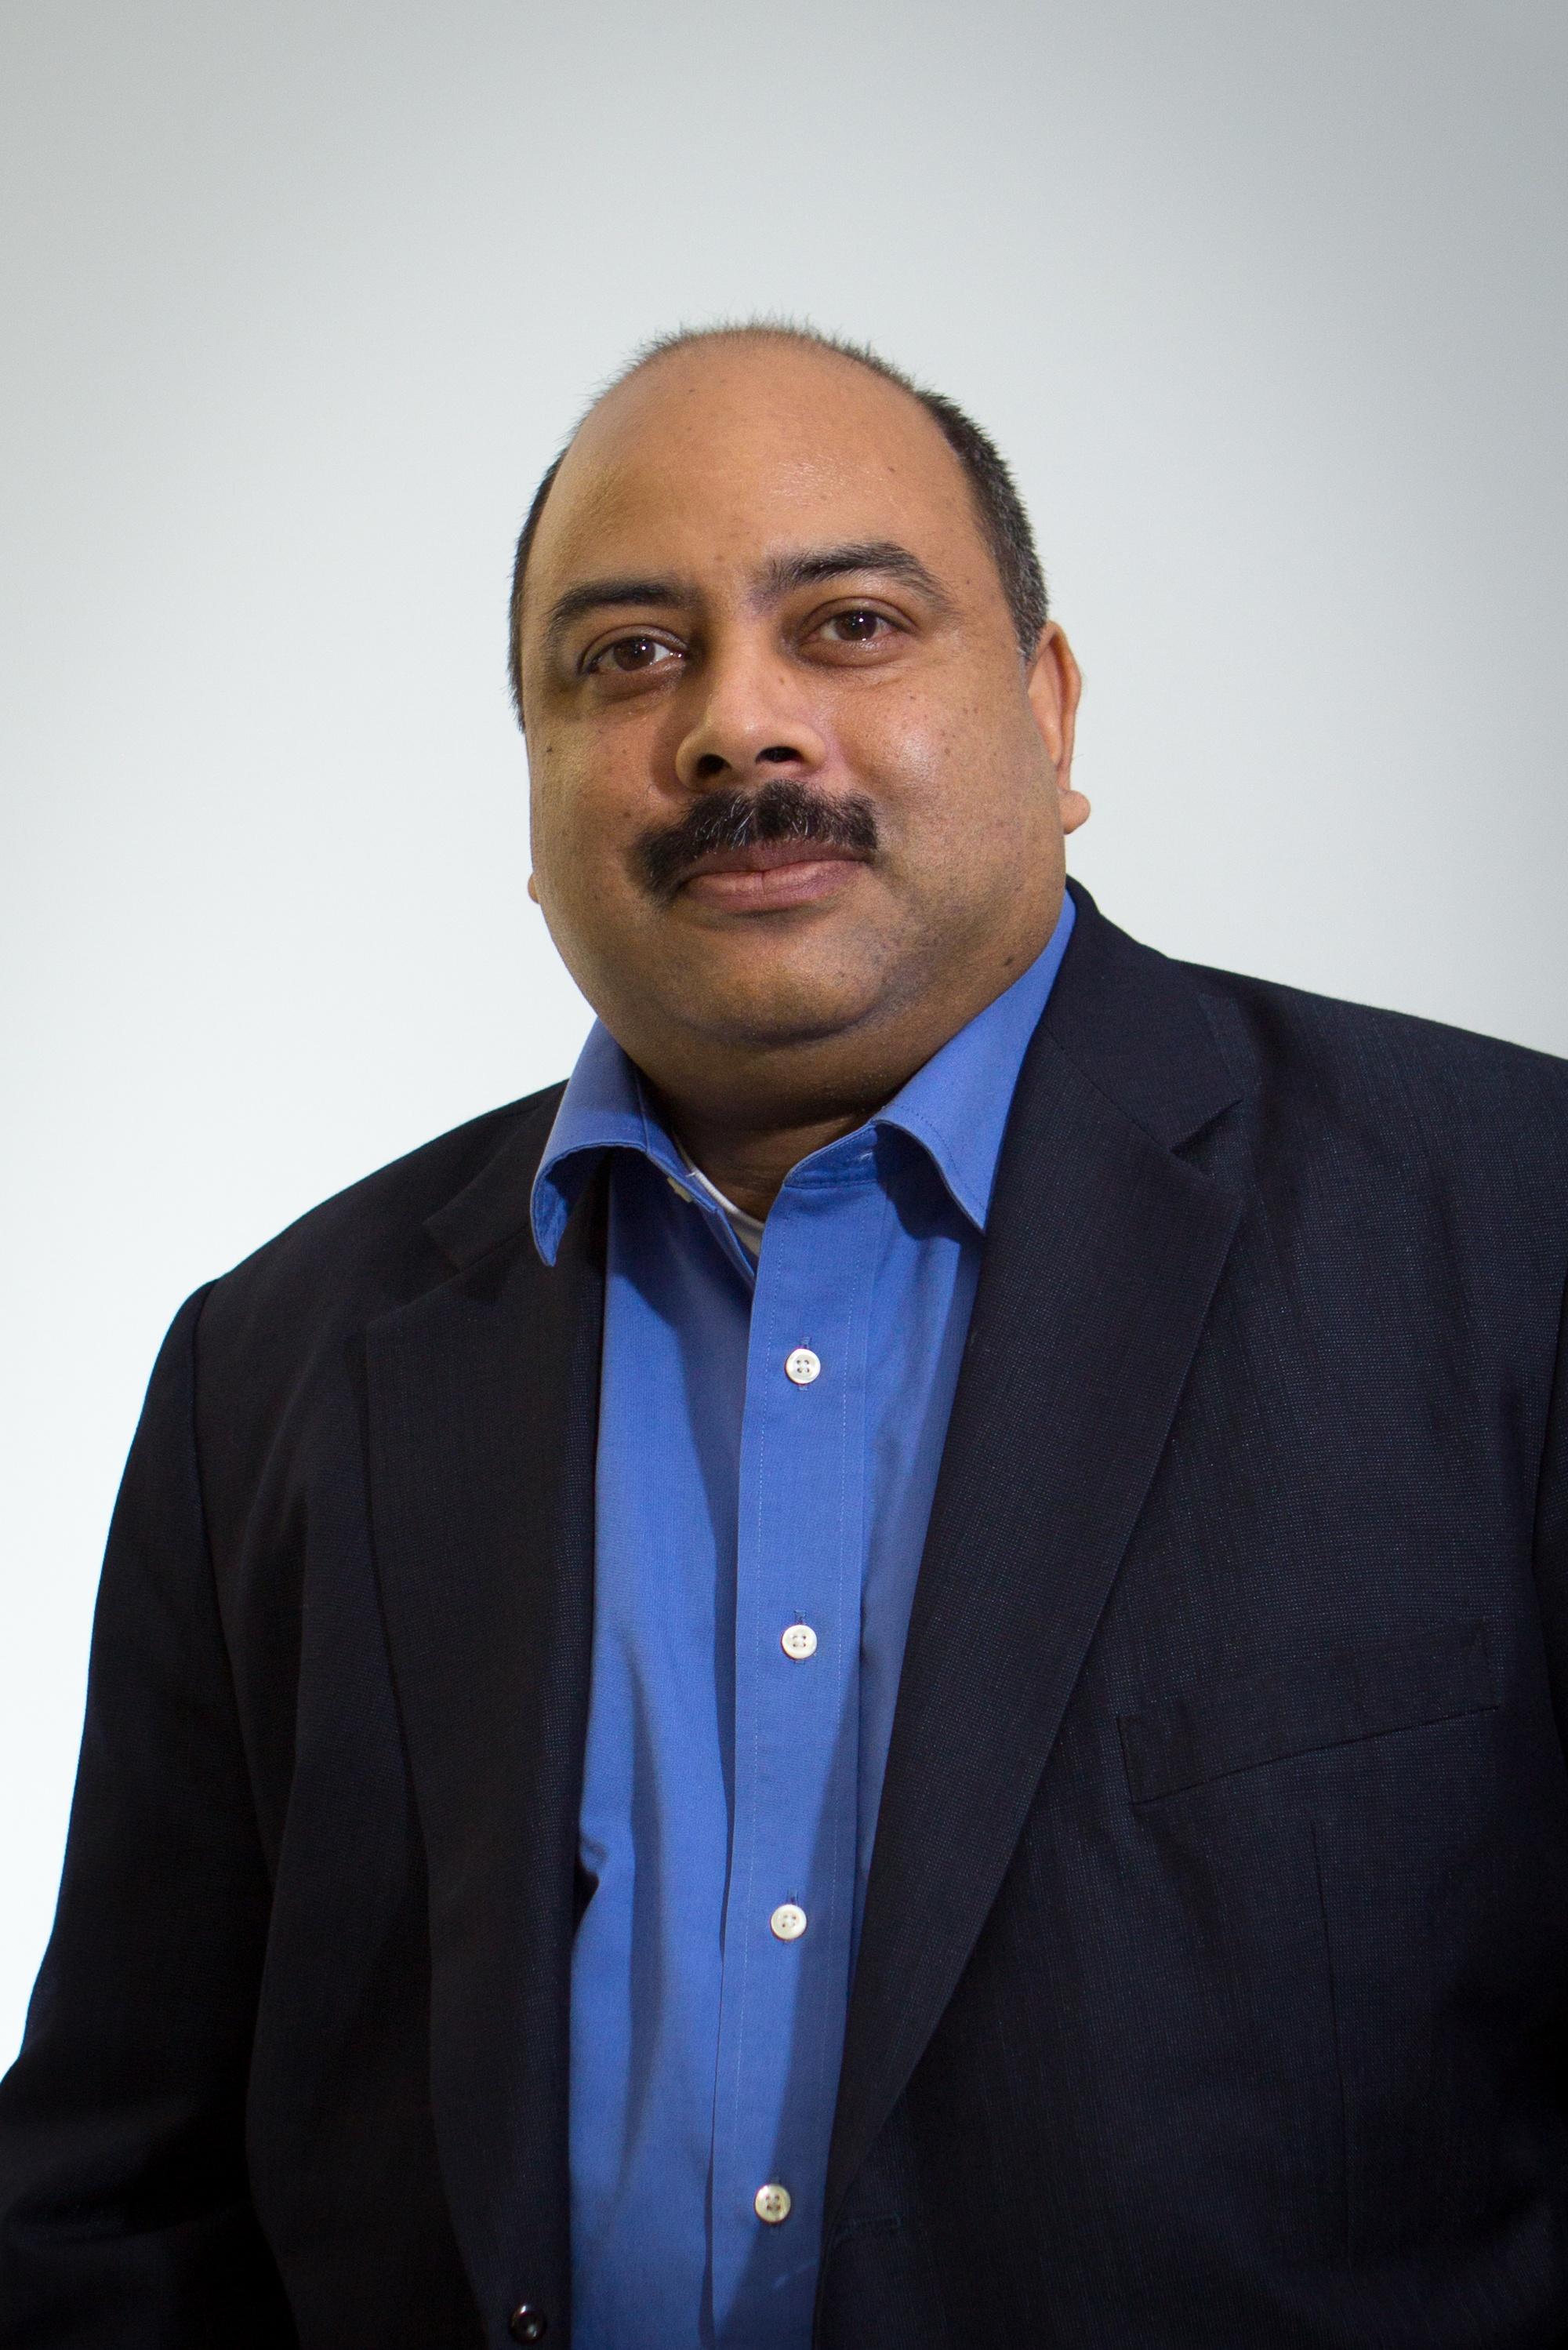 Ranjan Chatterjee Electronics Assembly Expert